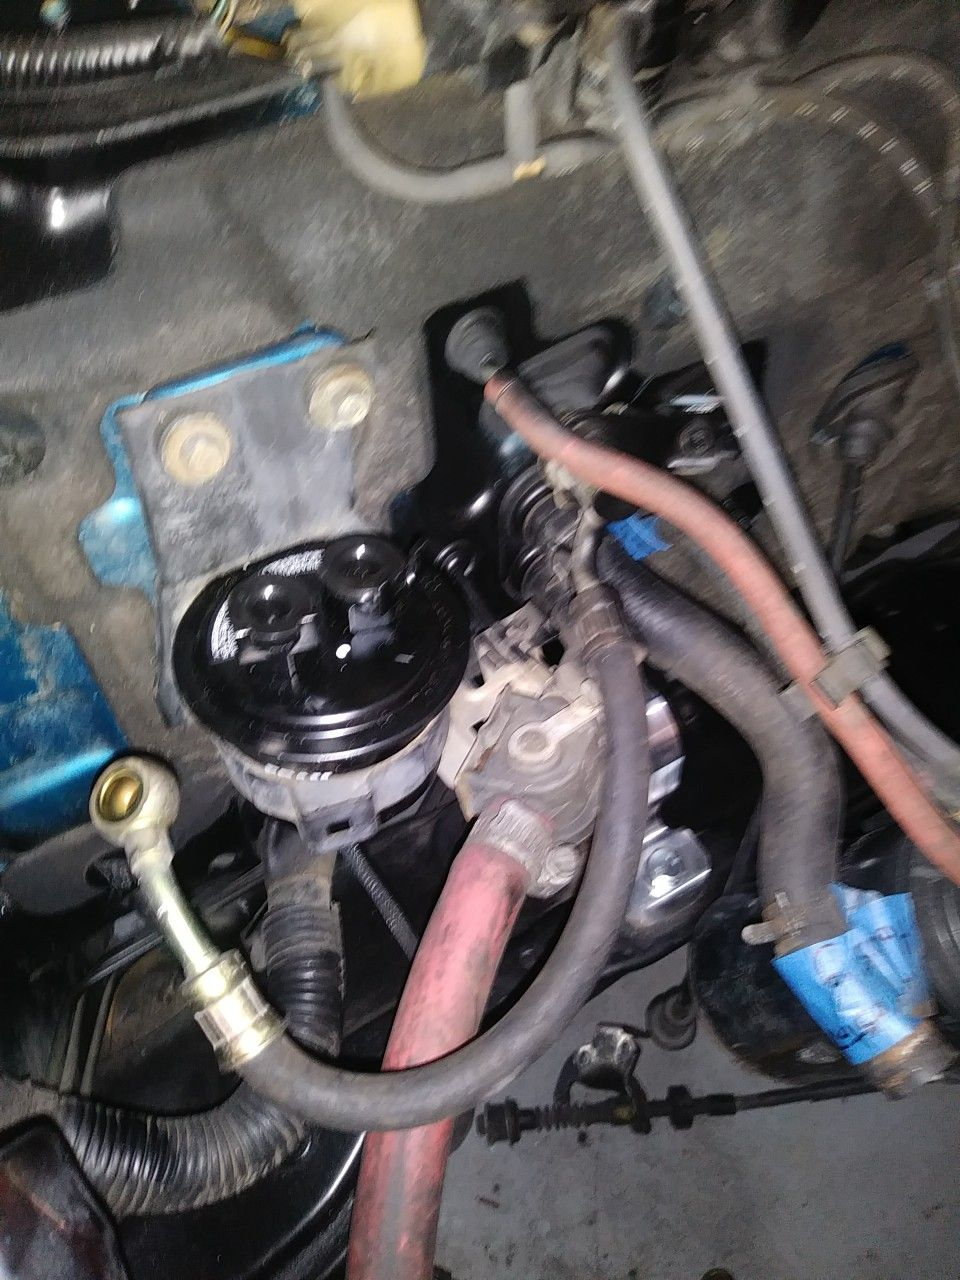 medium resolution of new fuel filter honda crx rebuild home appliances honda crxnew fuel filter honda crx